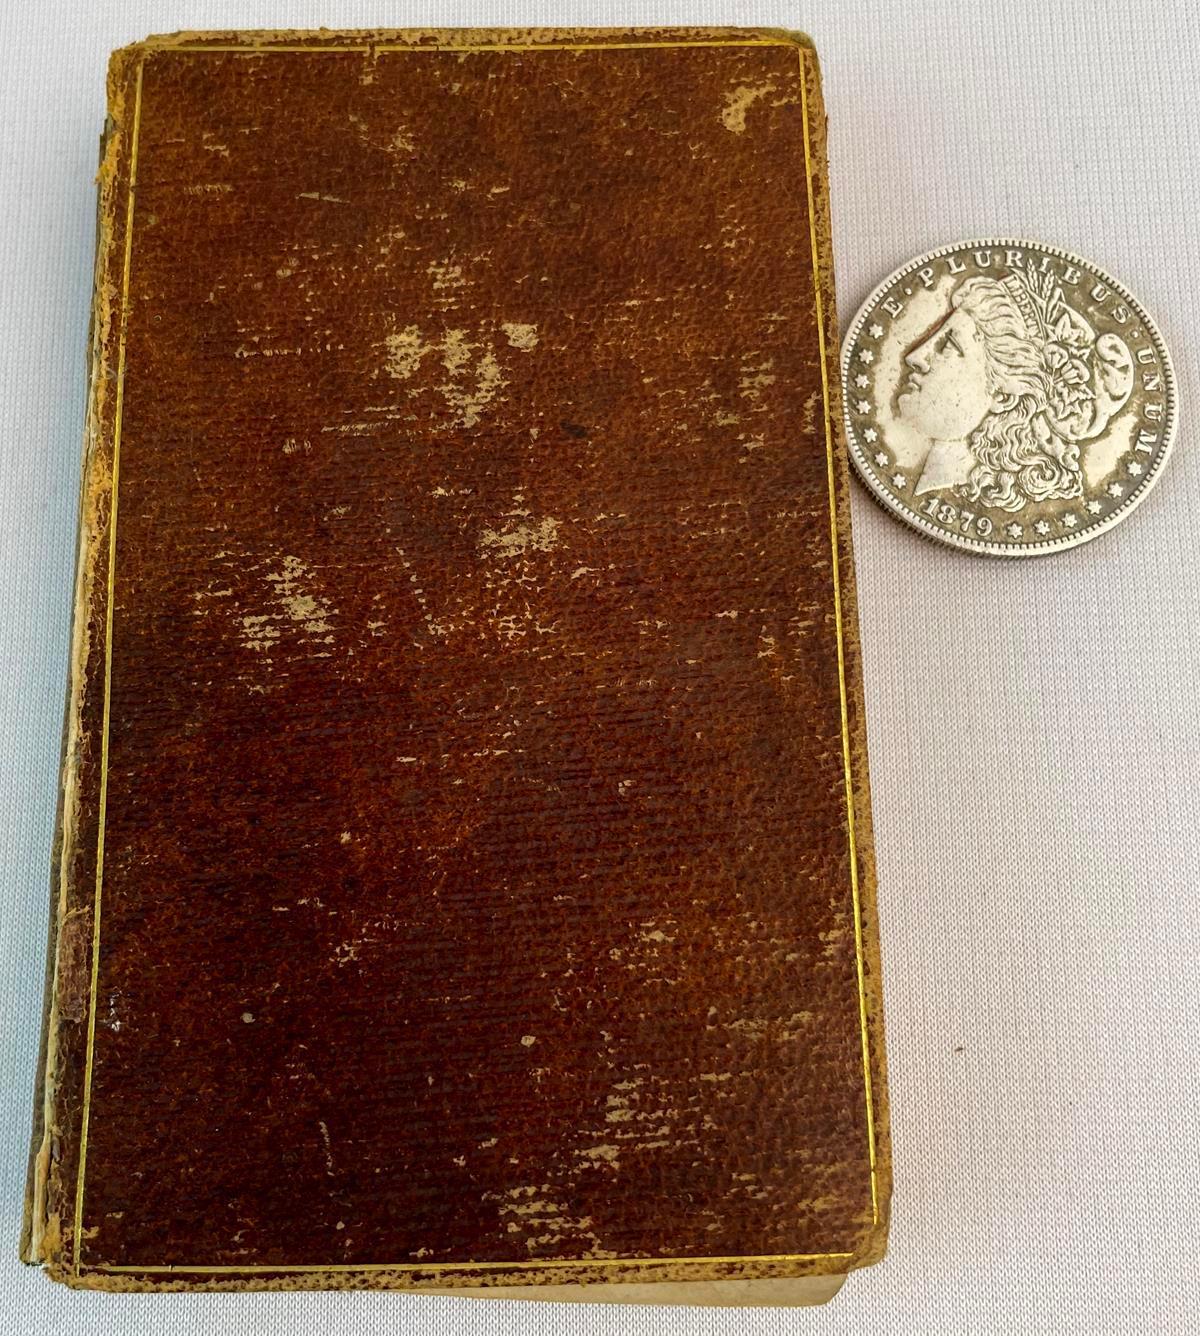 1833 Rasselas: A Tale by Dr. Johnson (Samuel Johnson) LEATHER